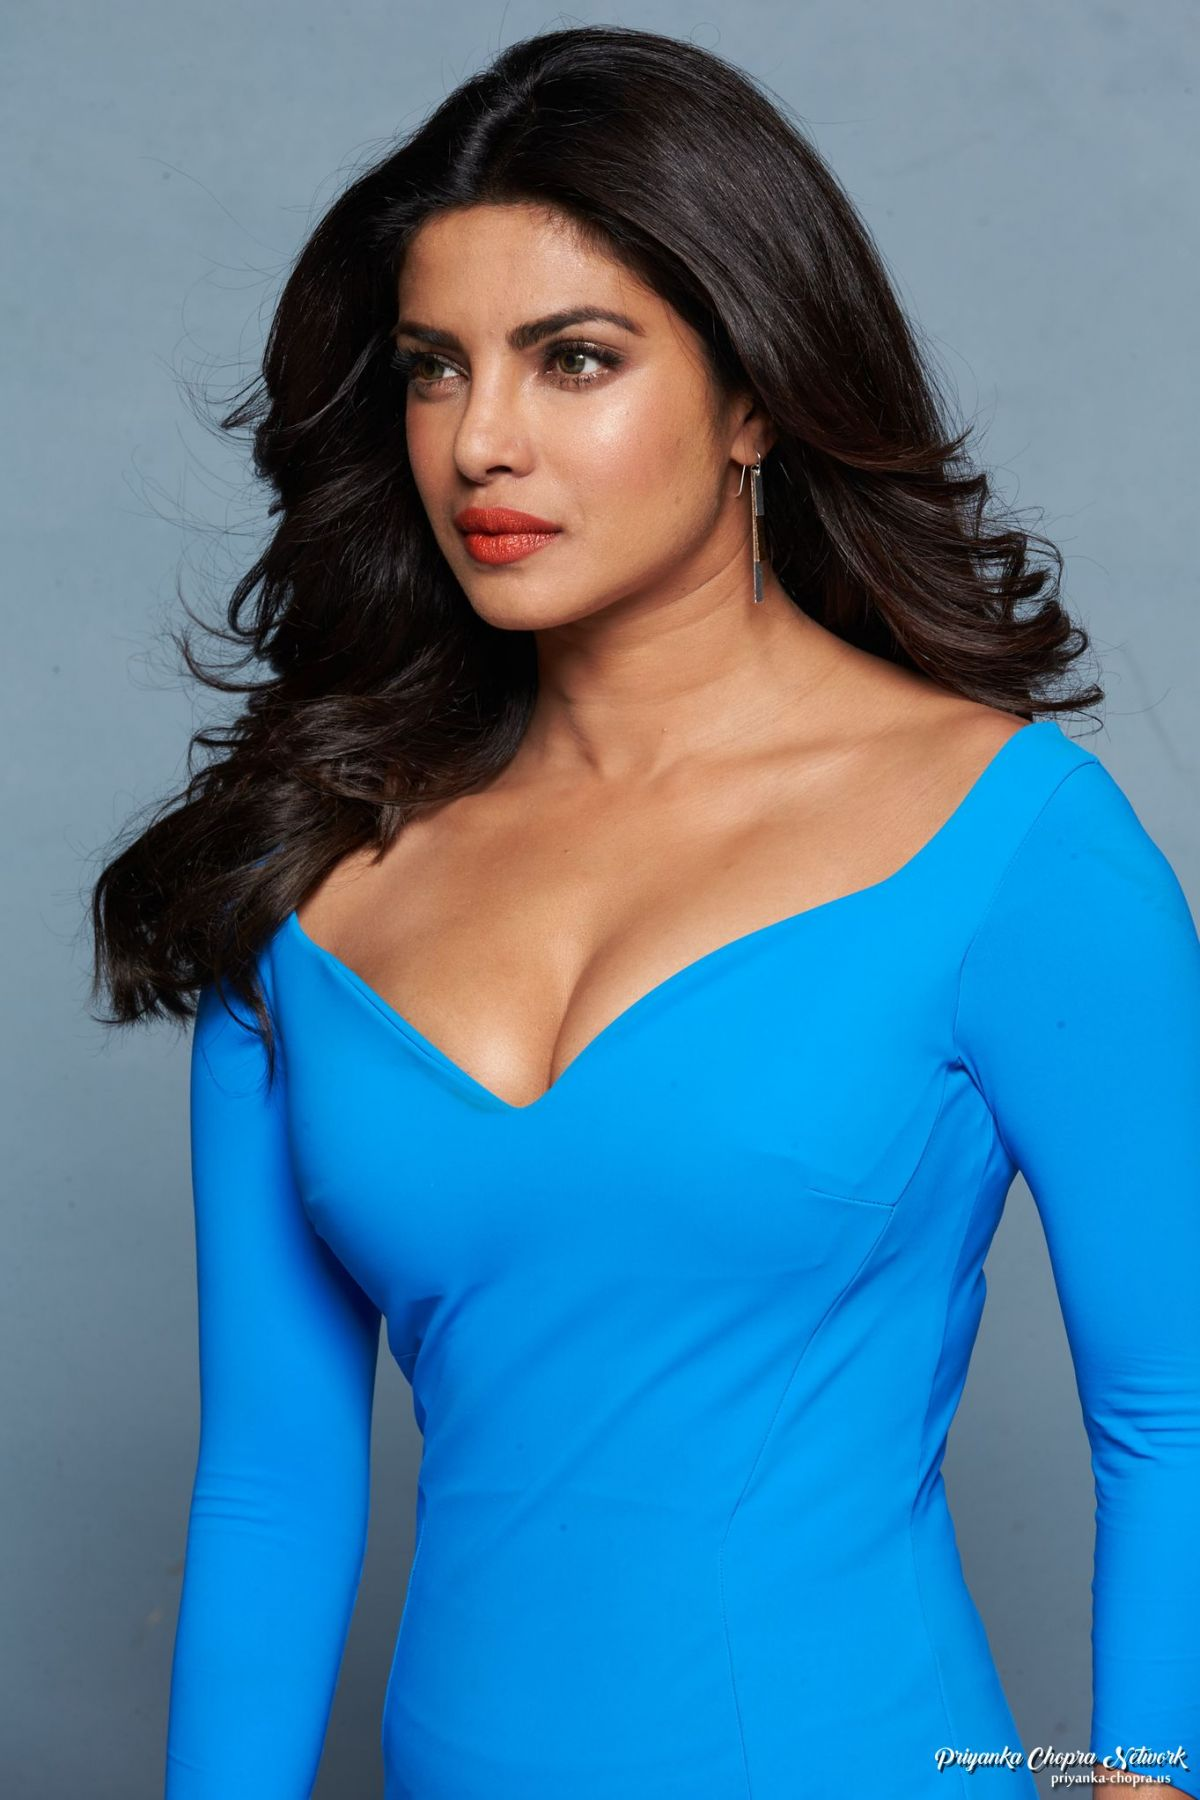 Priyanka Chopra Baywatch Promos Set 5 3 Hawtcelebs